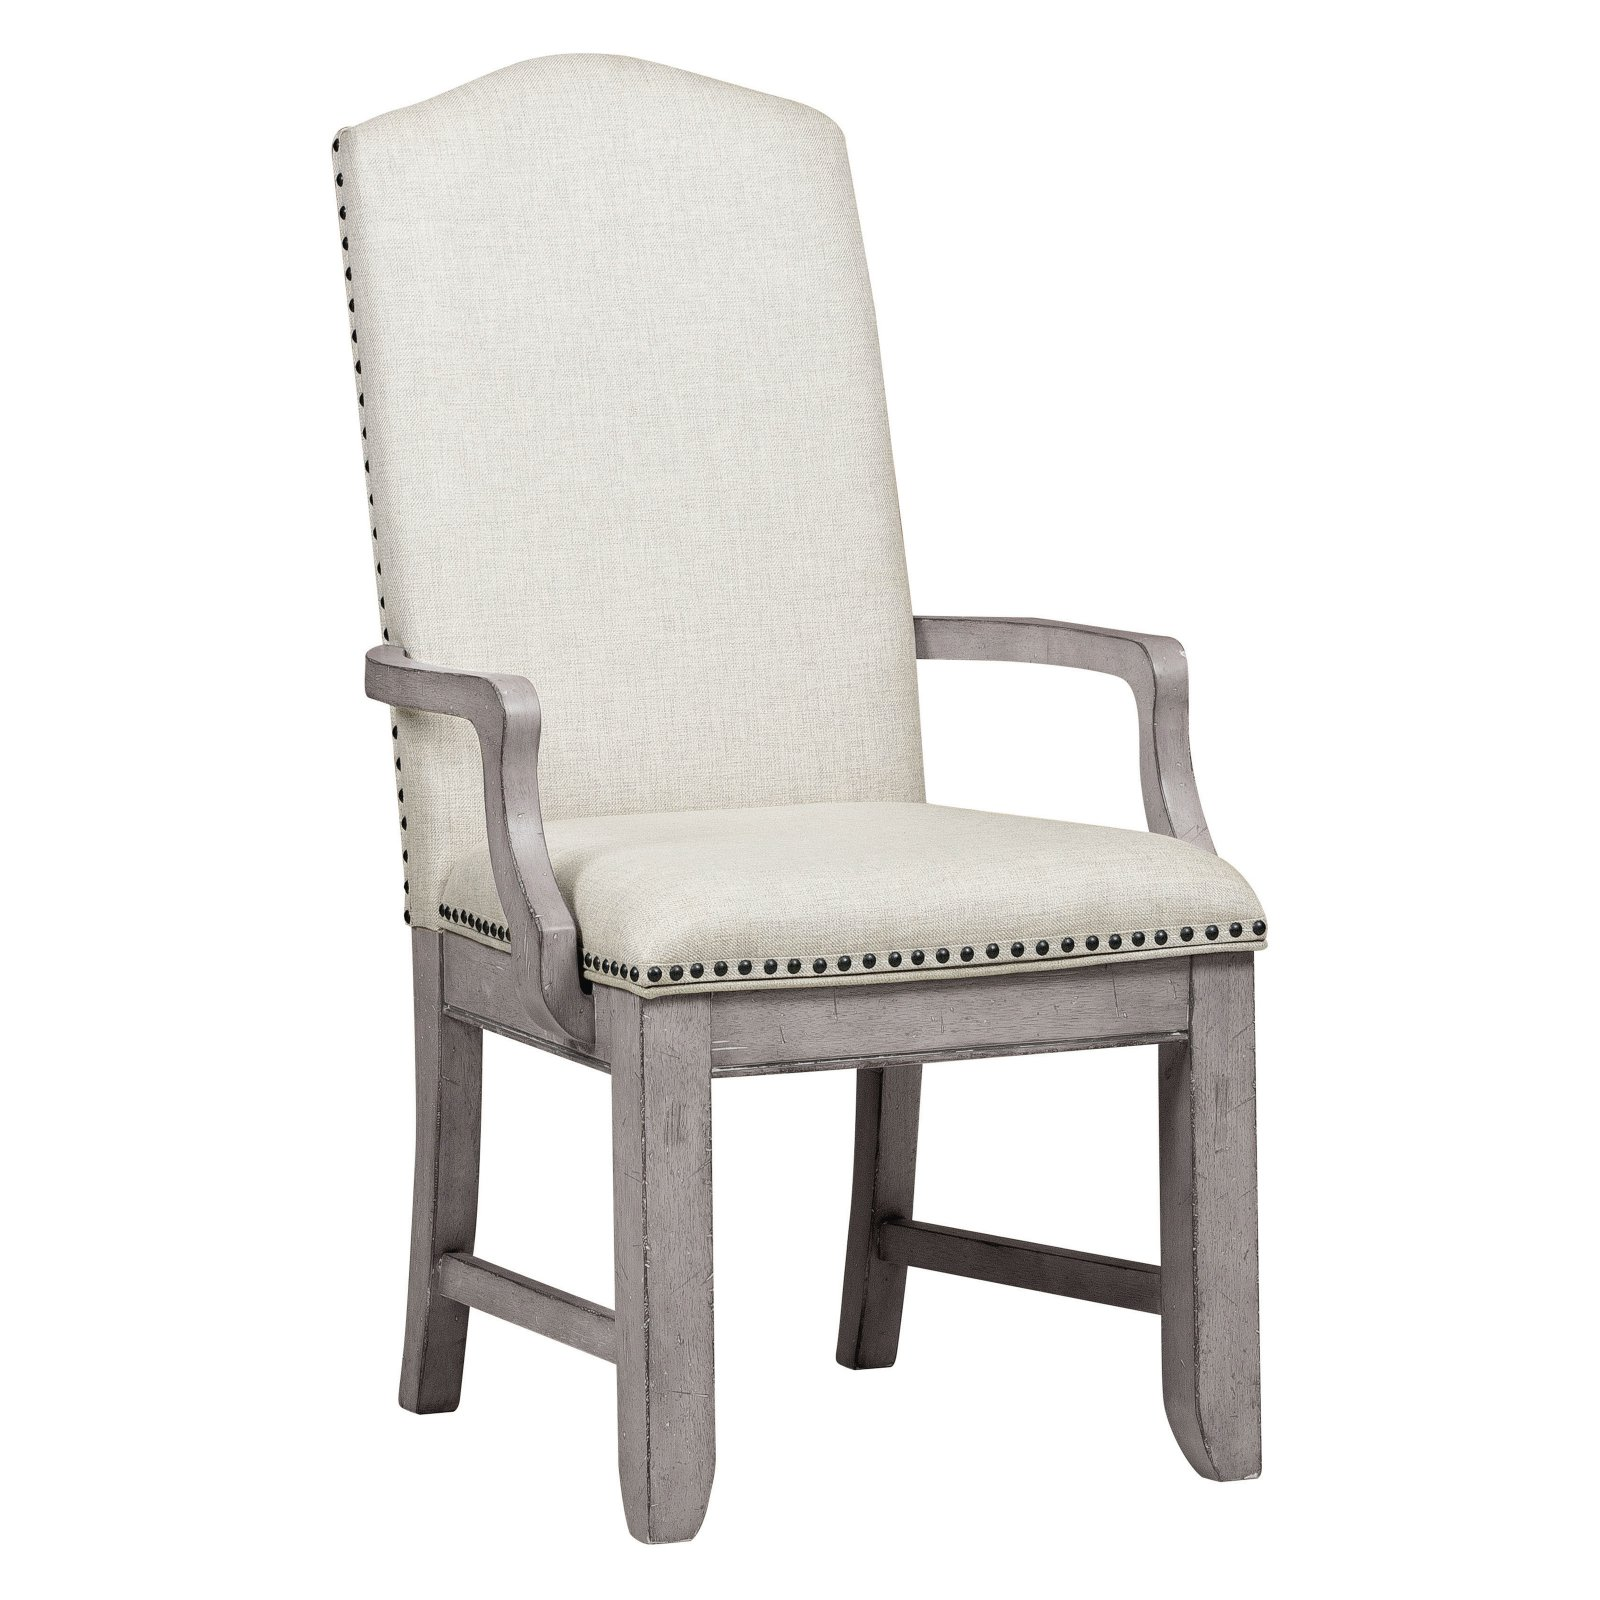 upholstered arm dining chair folding singapore slf room gear prospect hill back walmart com